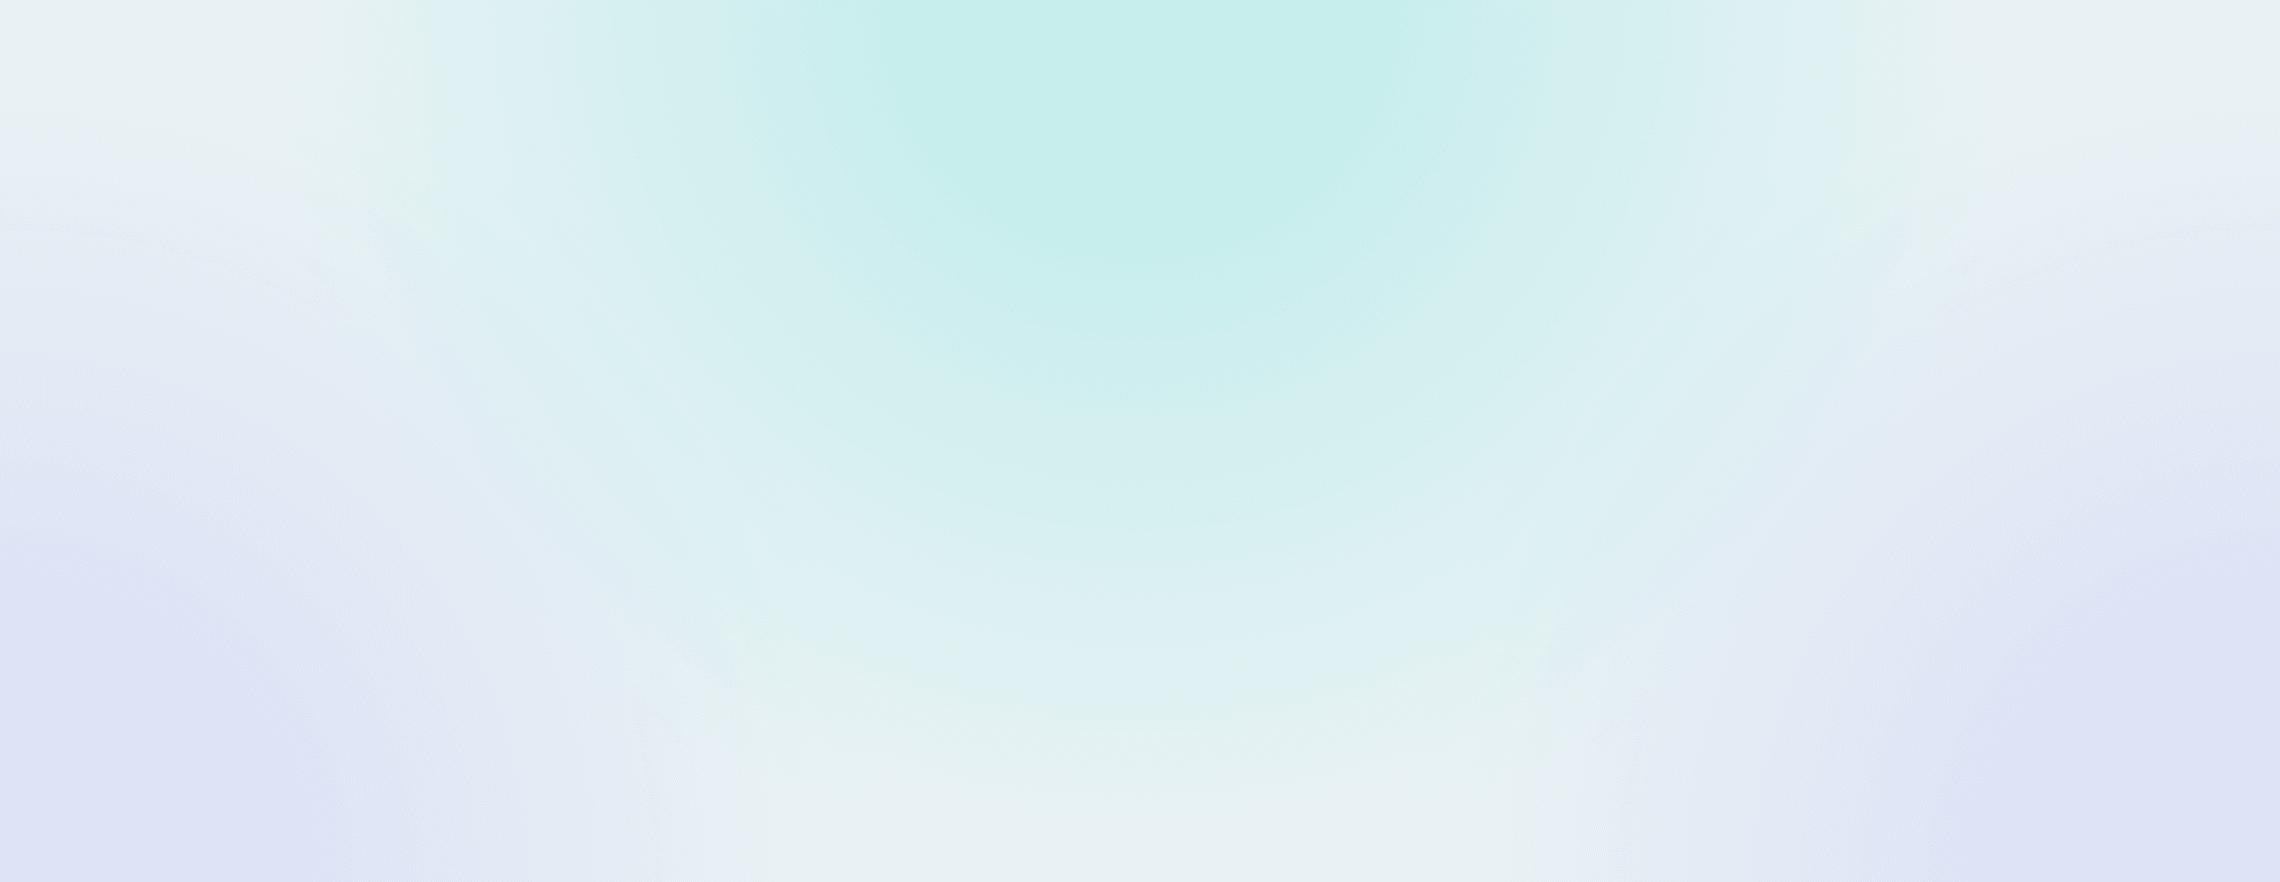 bg-purple-green-gradient